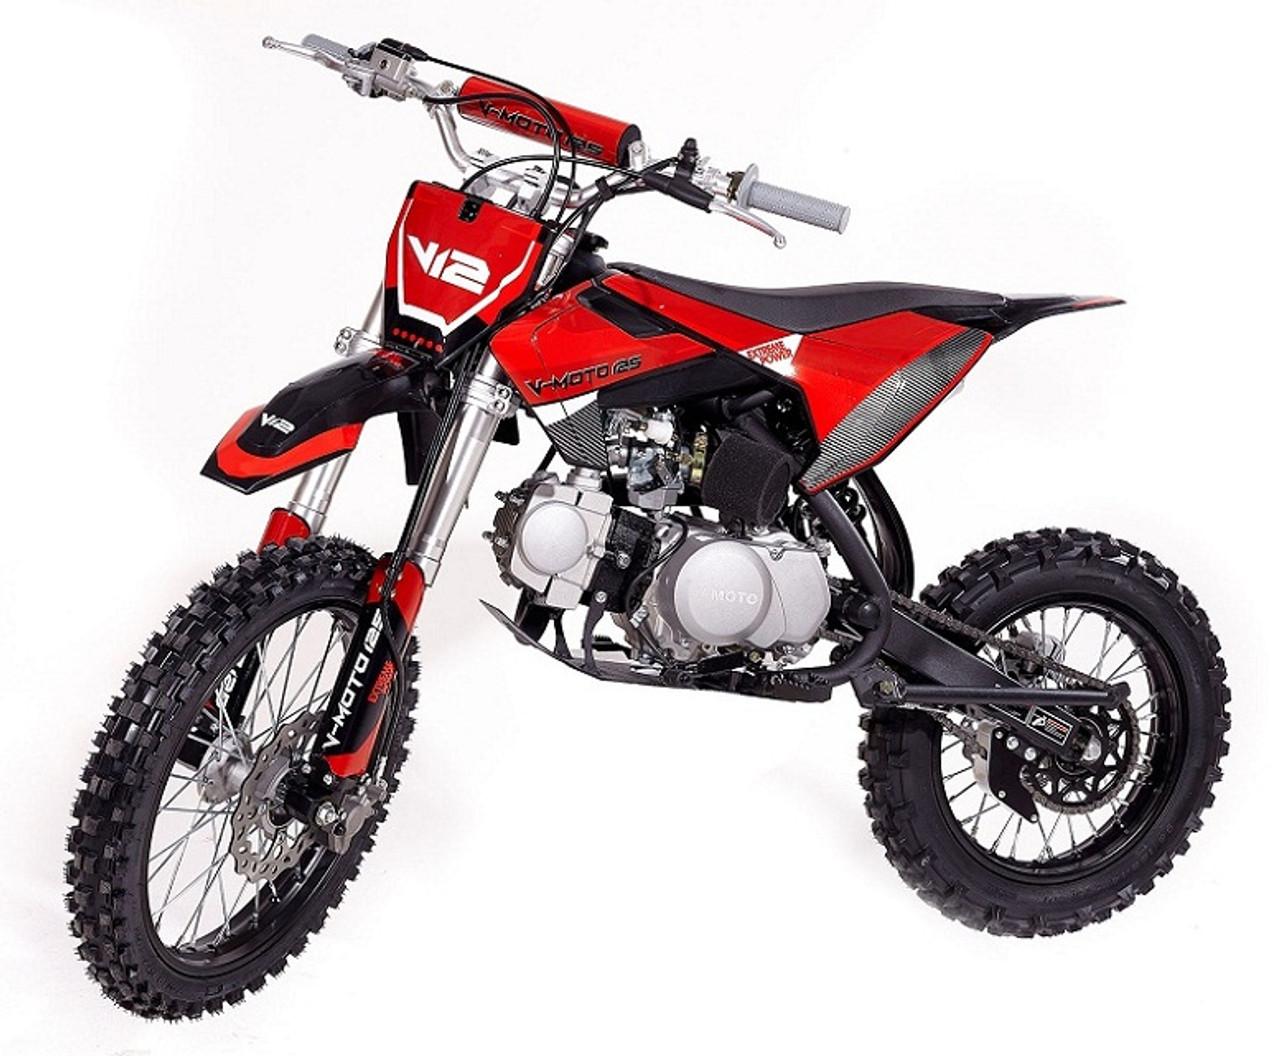 VITACCI DB-V12 124cc Dirt Bike, 5 Speed Manual, 4-Stroke, Air Cooled